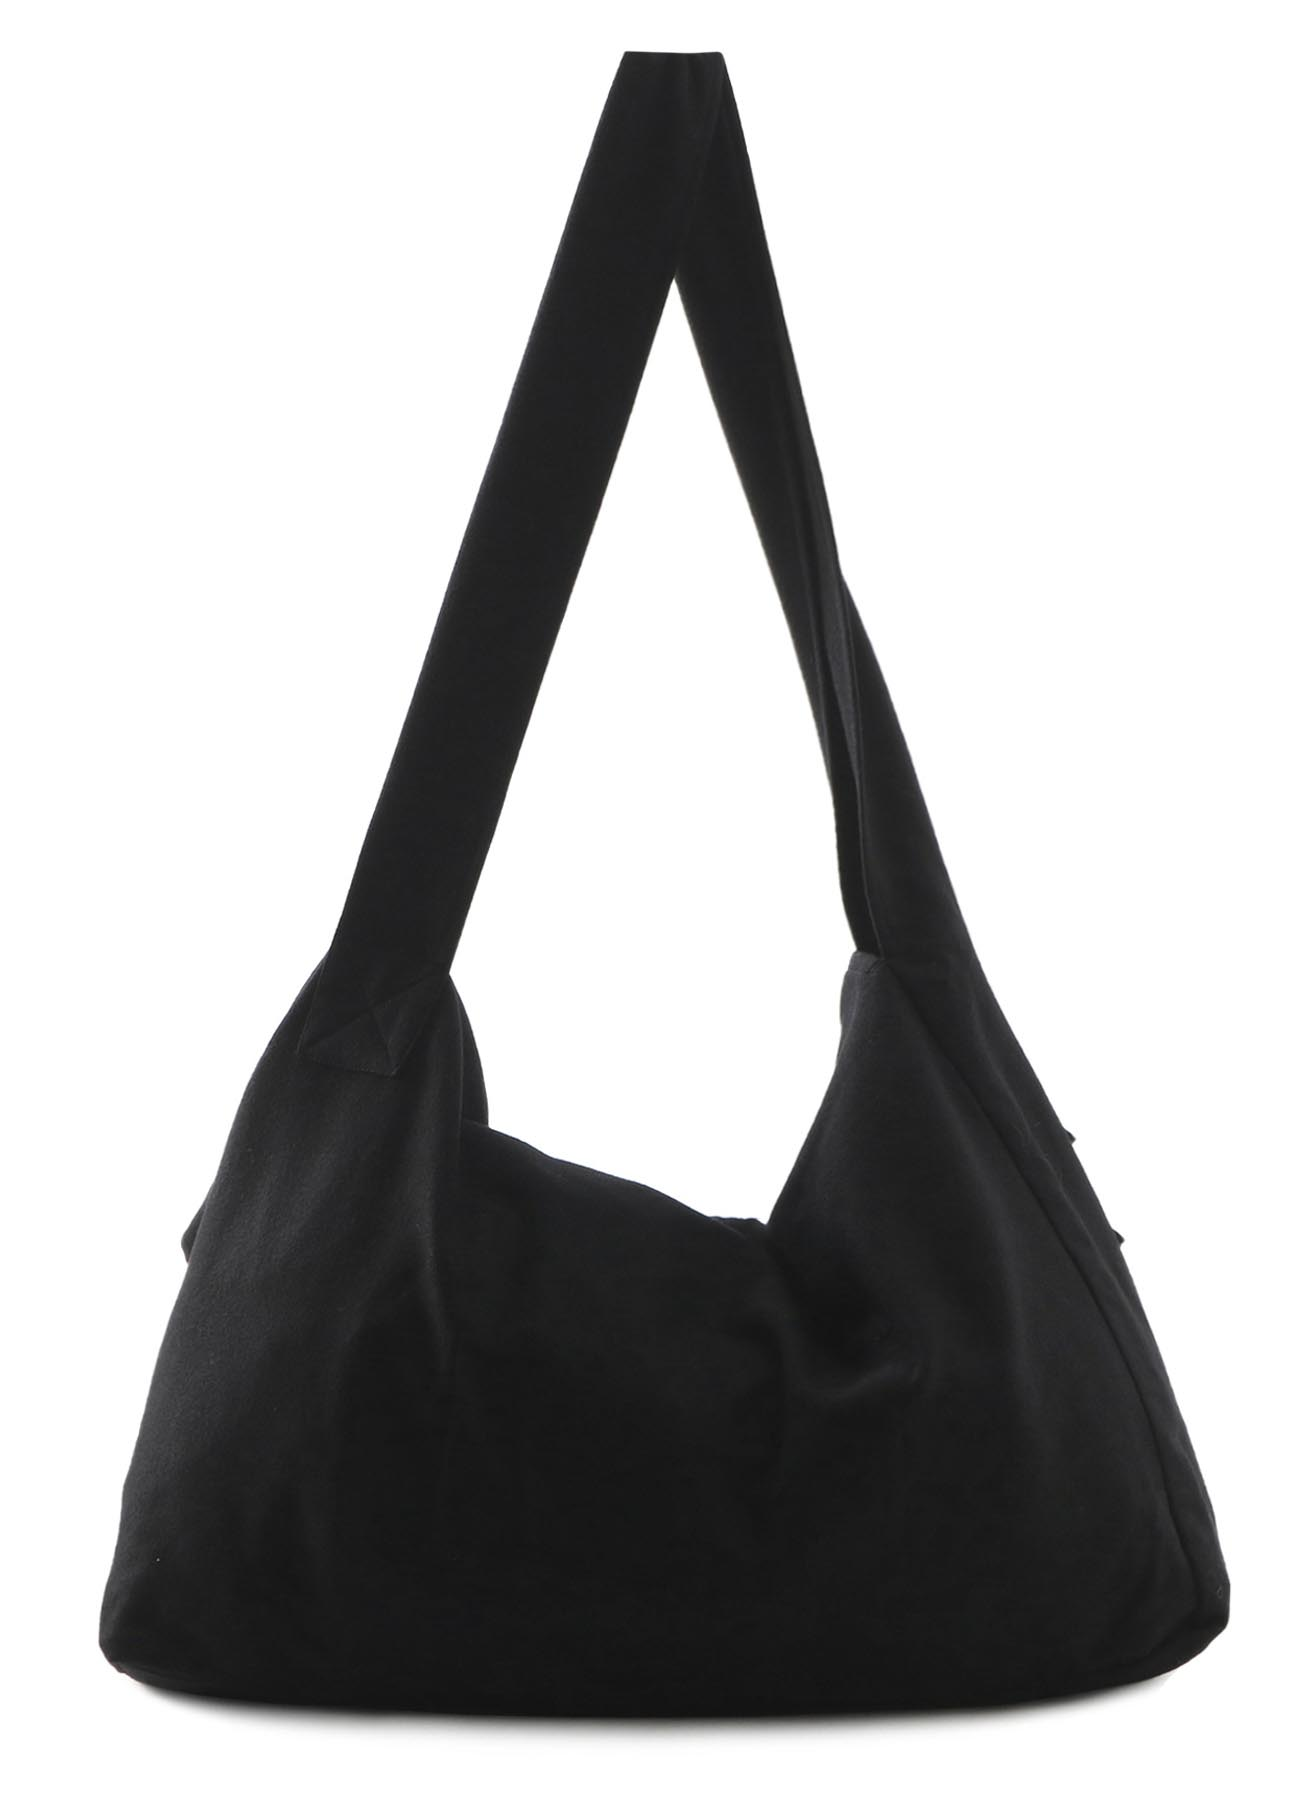 2/72 SP100'S FLANNEL TIED BAG